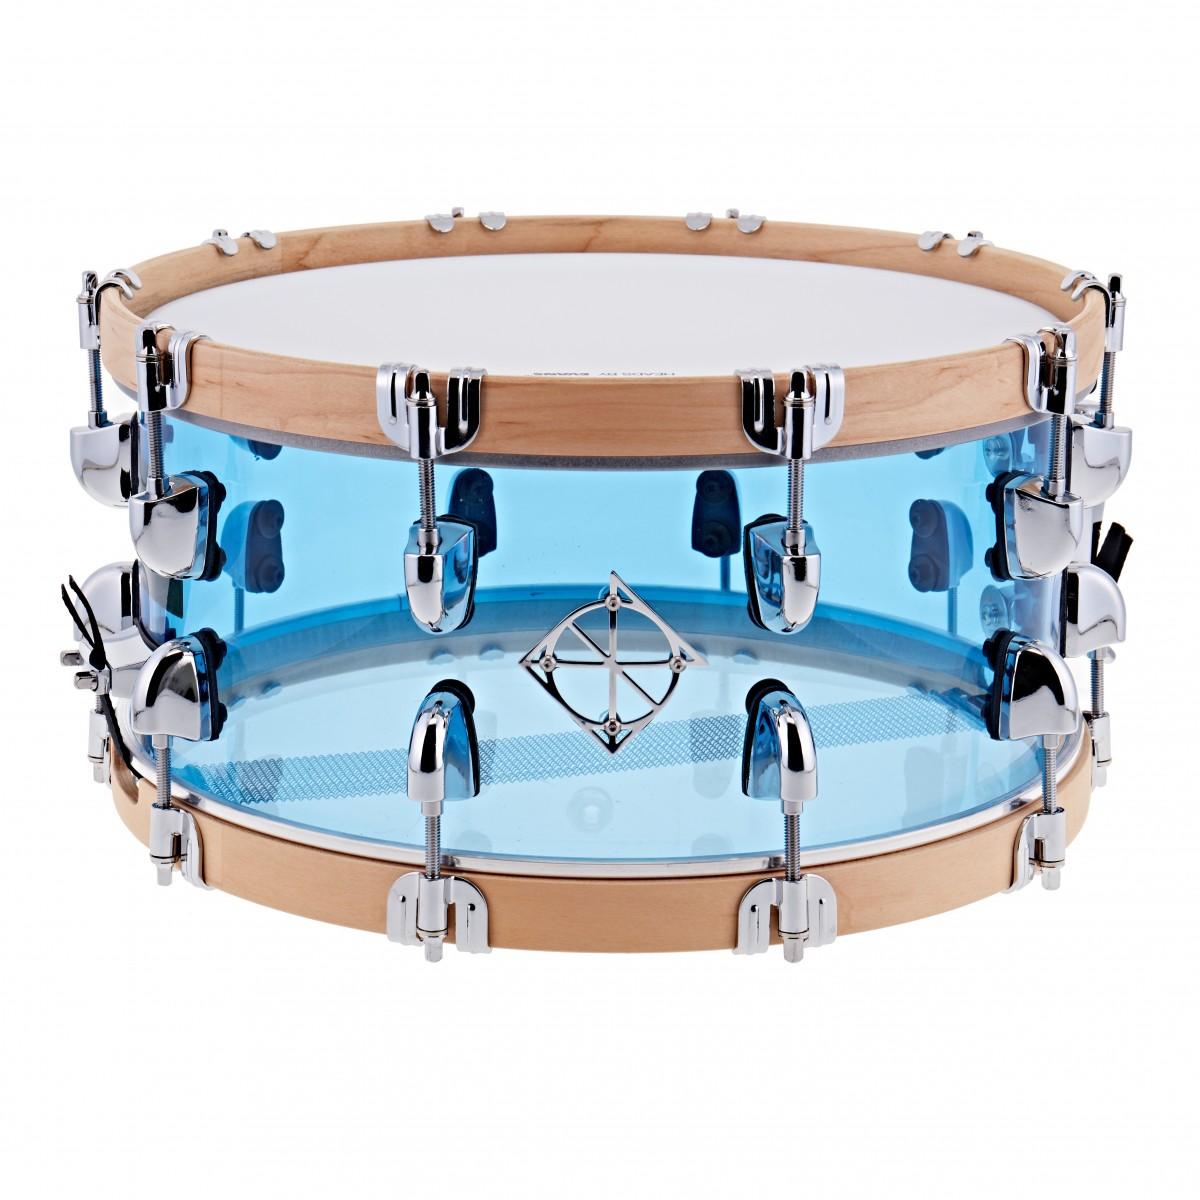 Dixon Drums 14 x 6.5 Cornerstone Blue Acrylic w/Maple Hoops